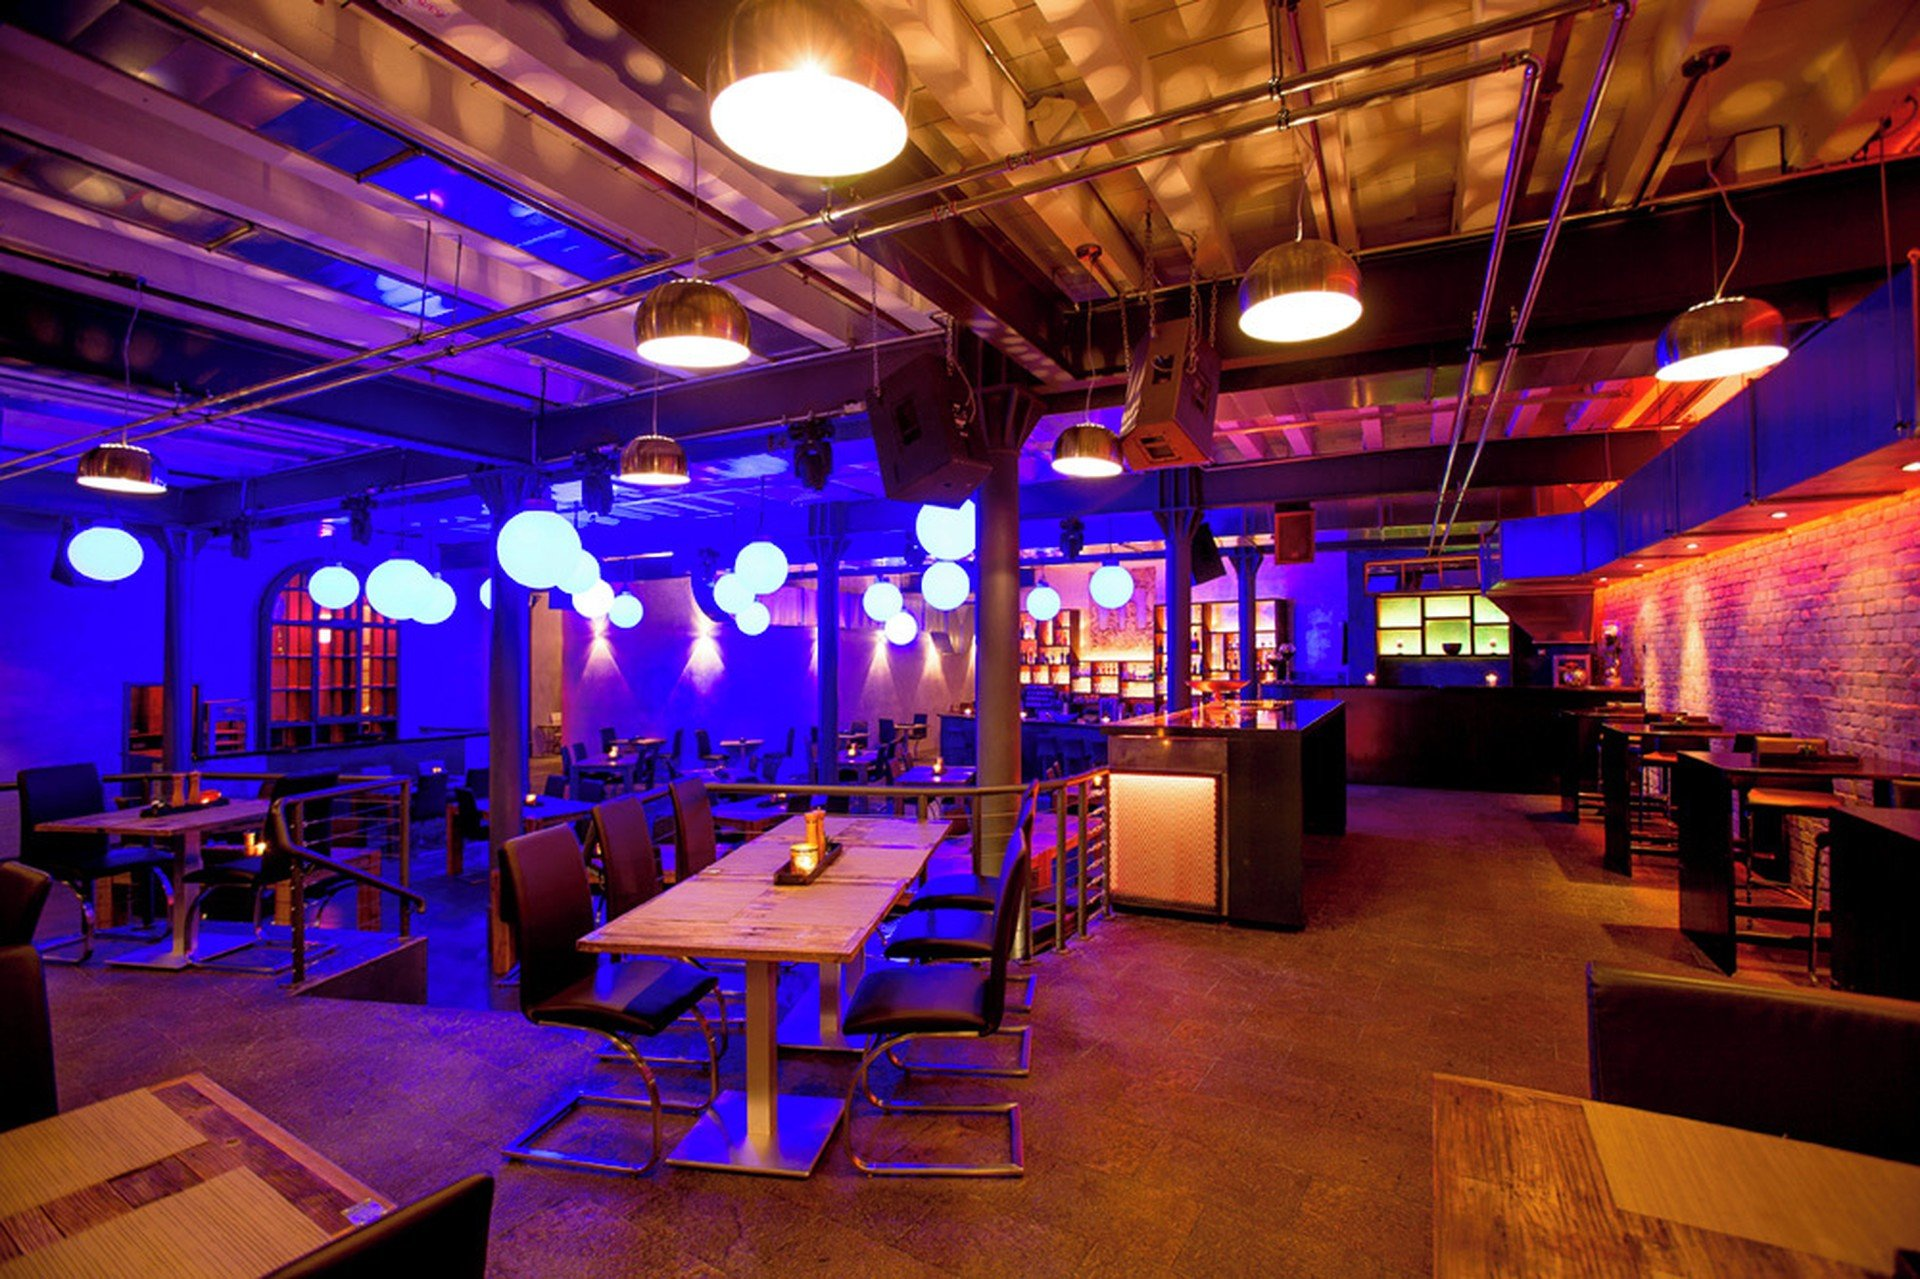 Mannheim corporate event venues Restaurant Manufaktur hinterer Teil (mit Beach Bar) image 5